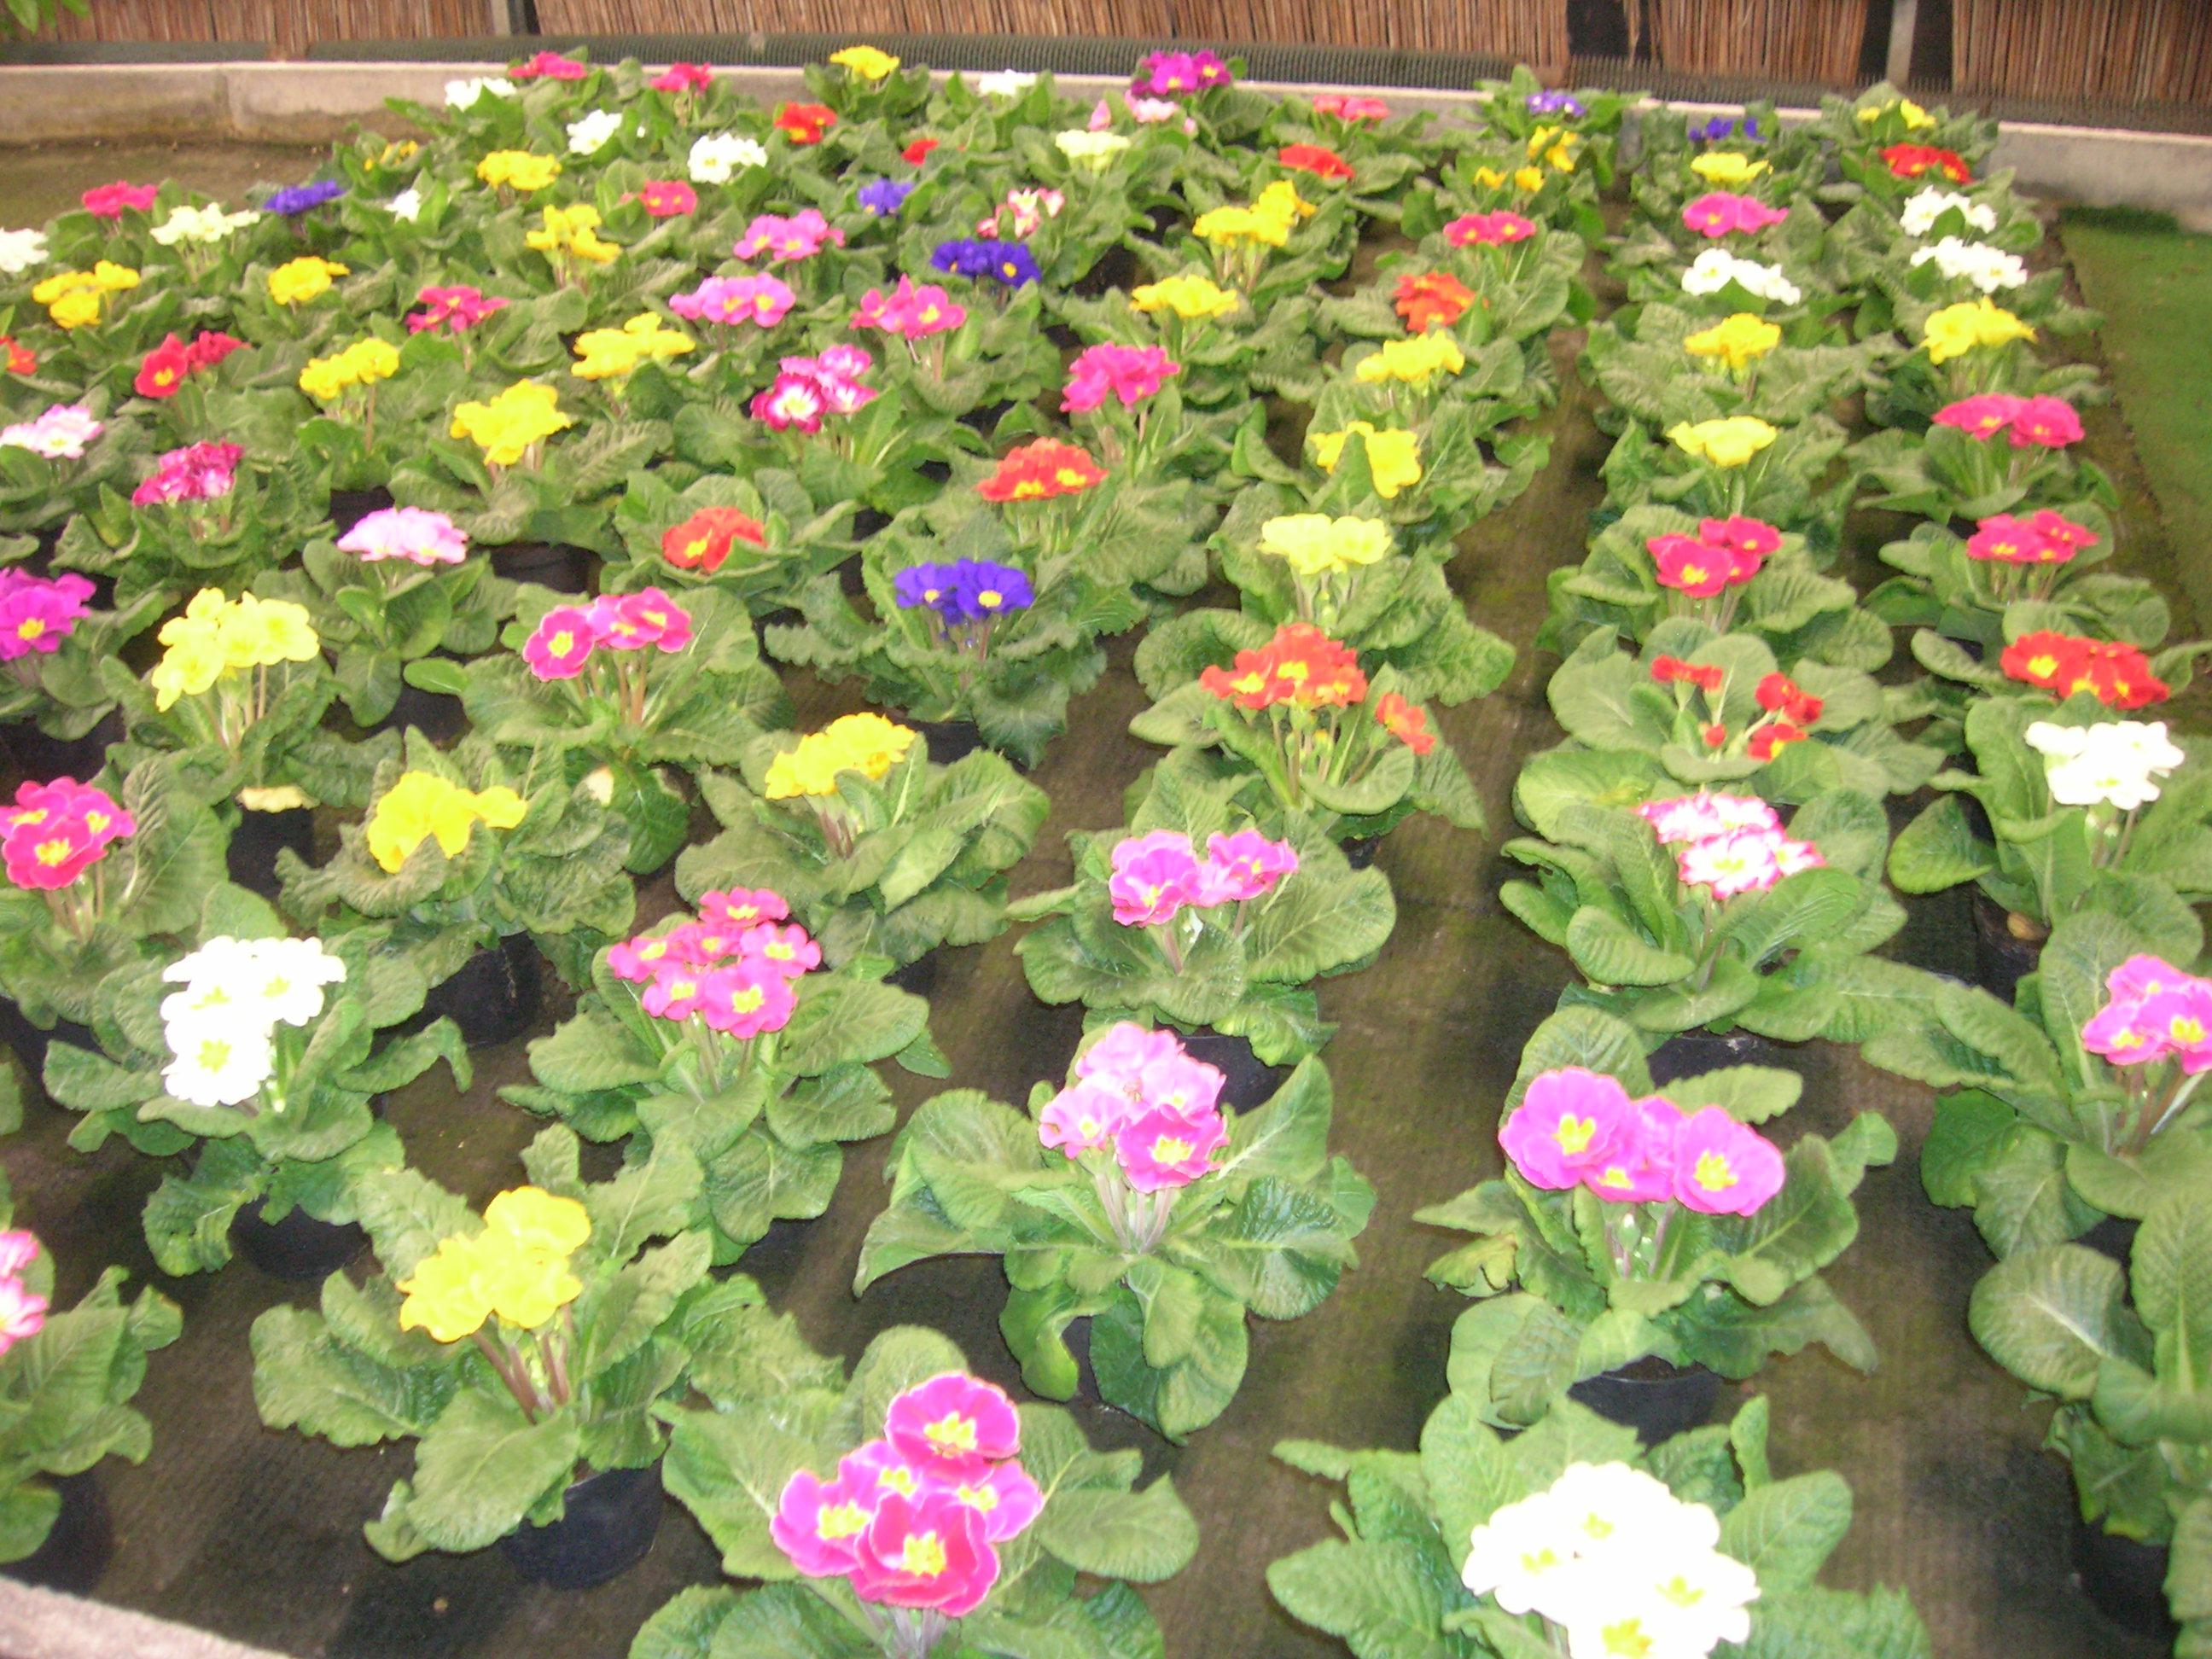 Rose gerani begonie petunie surfinie viole ciclamini - Azalea pianta da interno o esterno ...